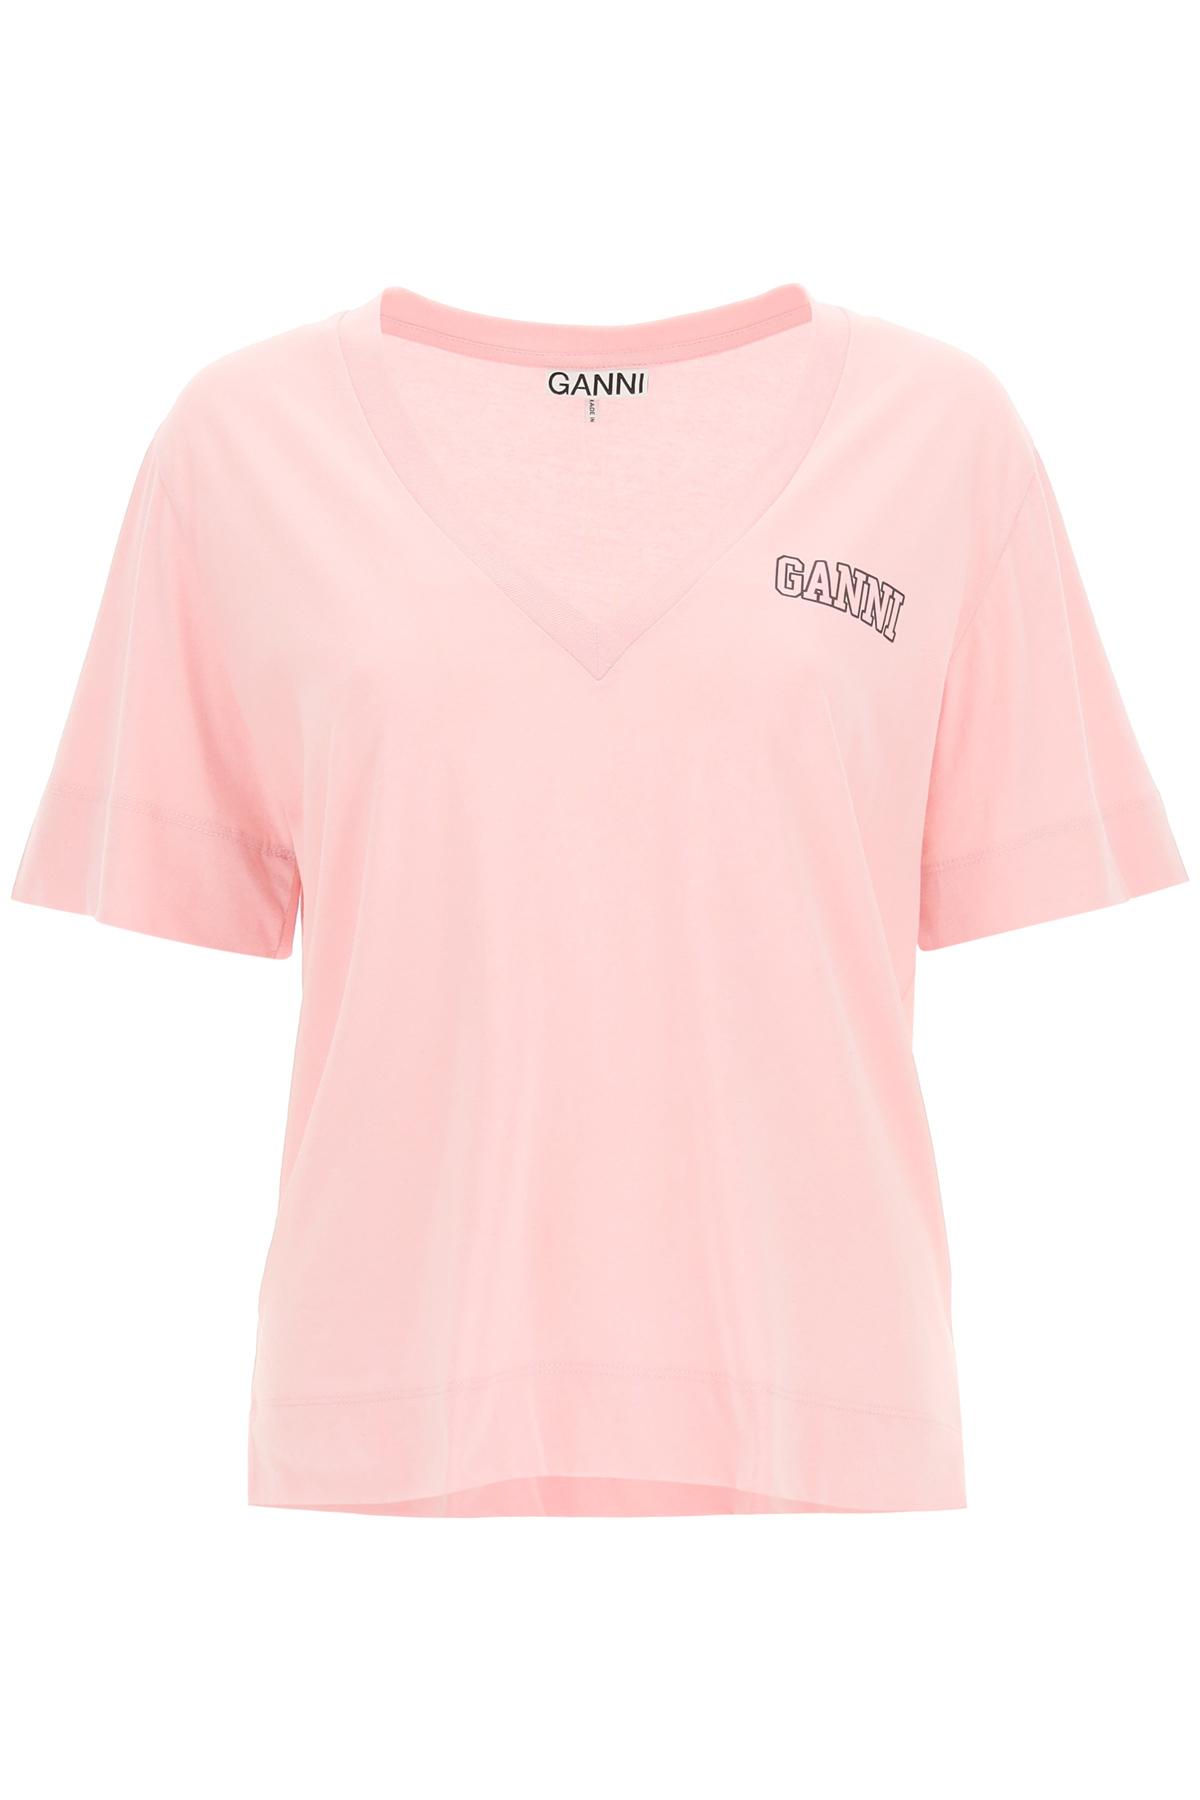 Ganni t-shirt software isoli